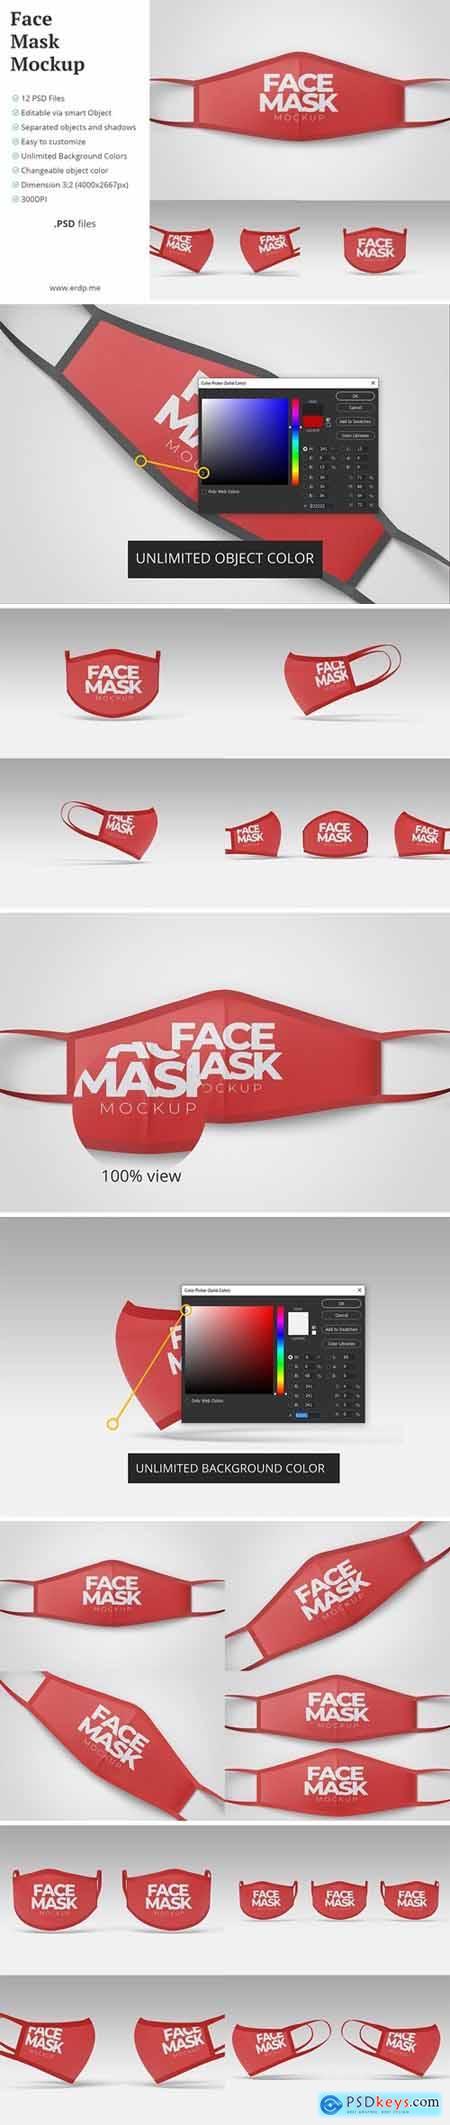 Face Mask Mockup - 12 PSD Files